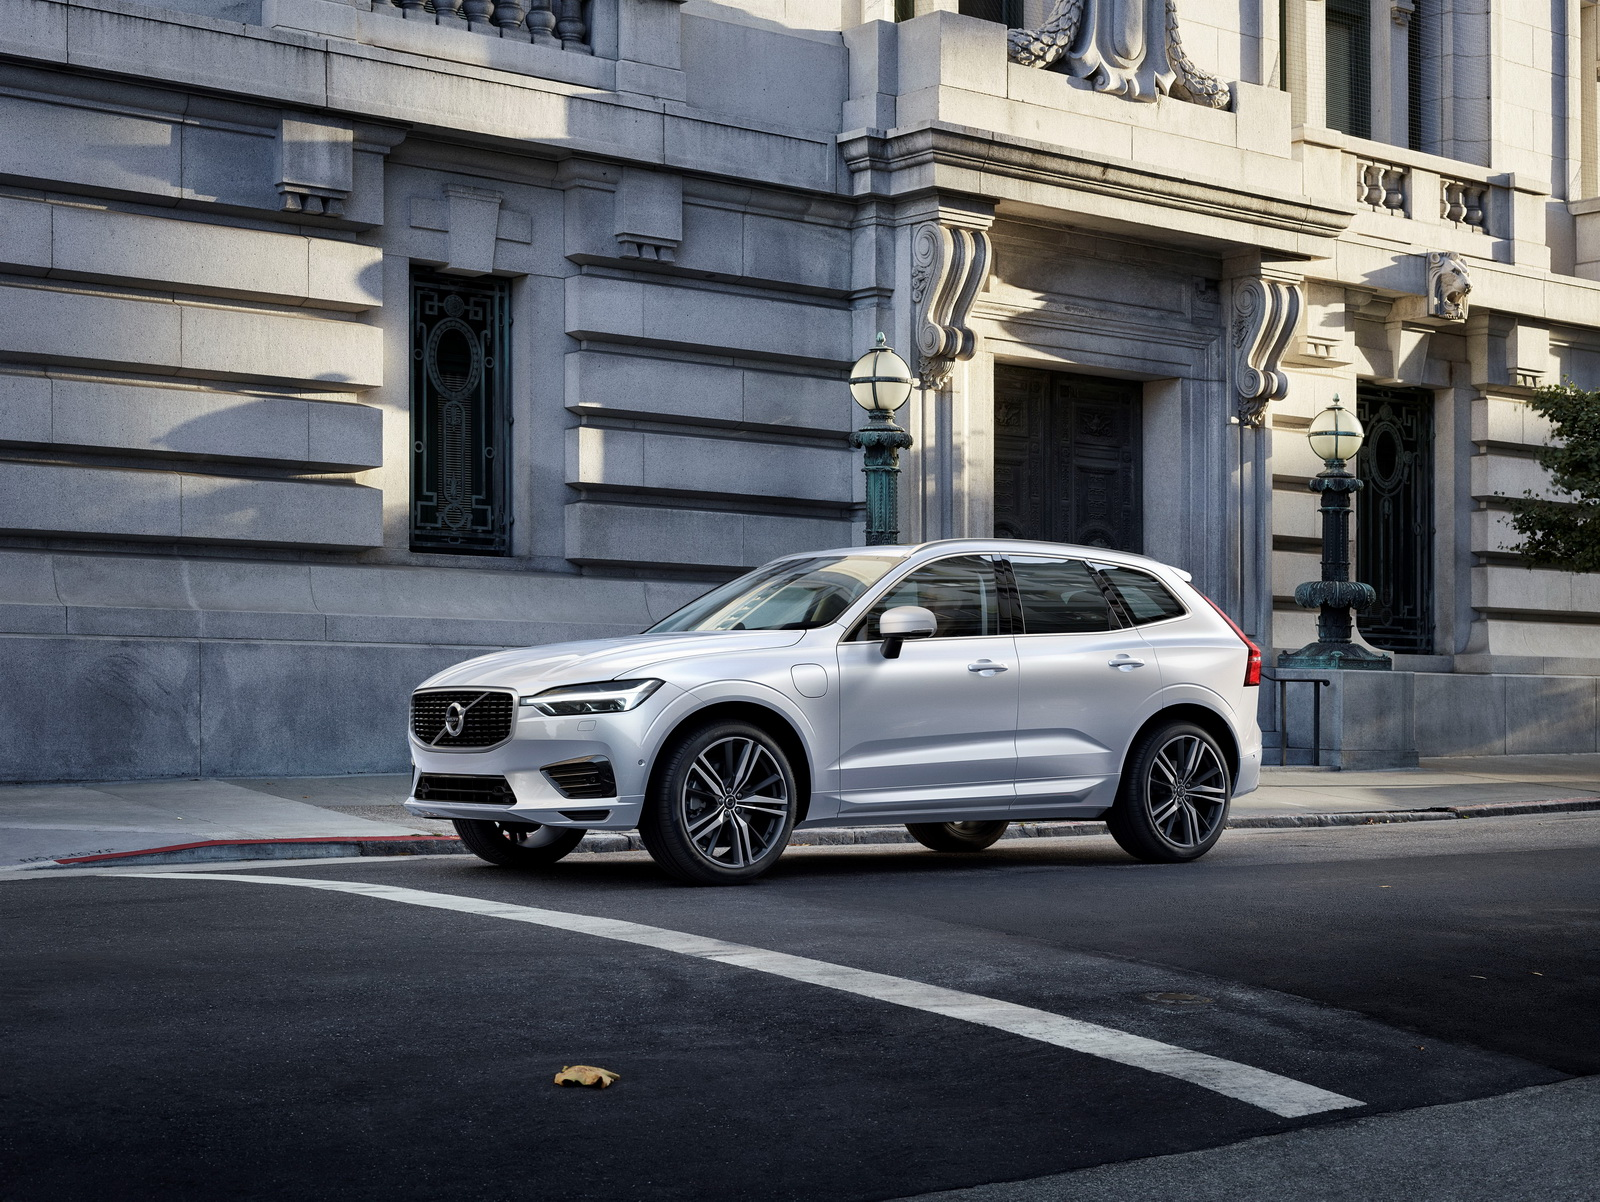 Geneva 2017: Volvo reveals all-new XC60 SUV